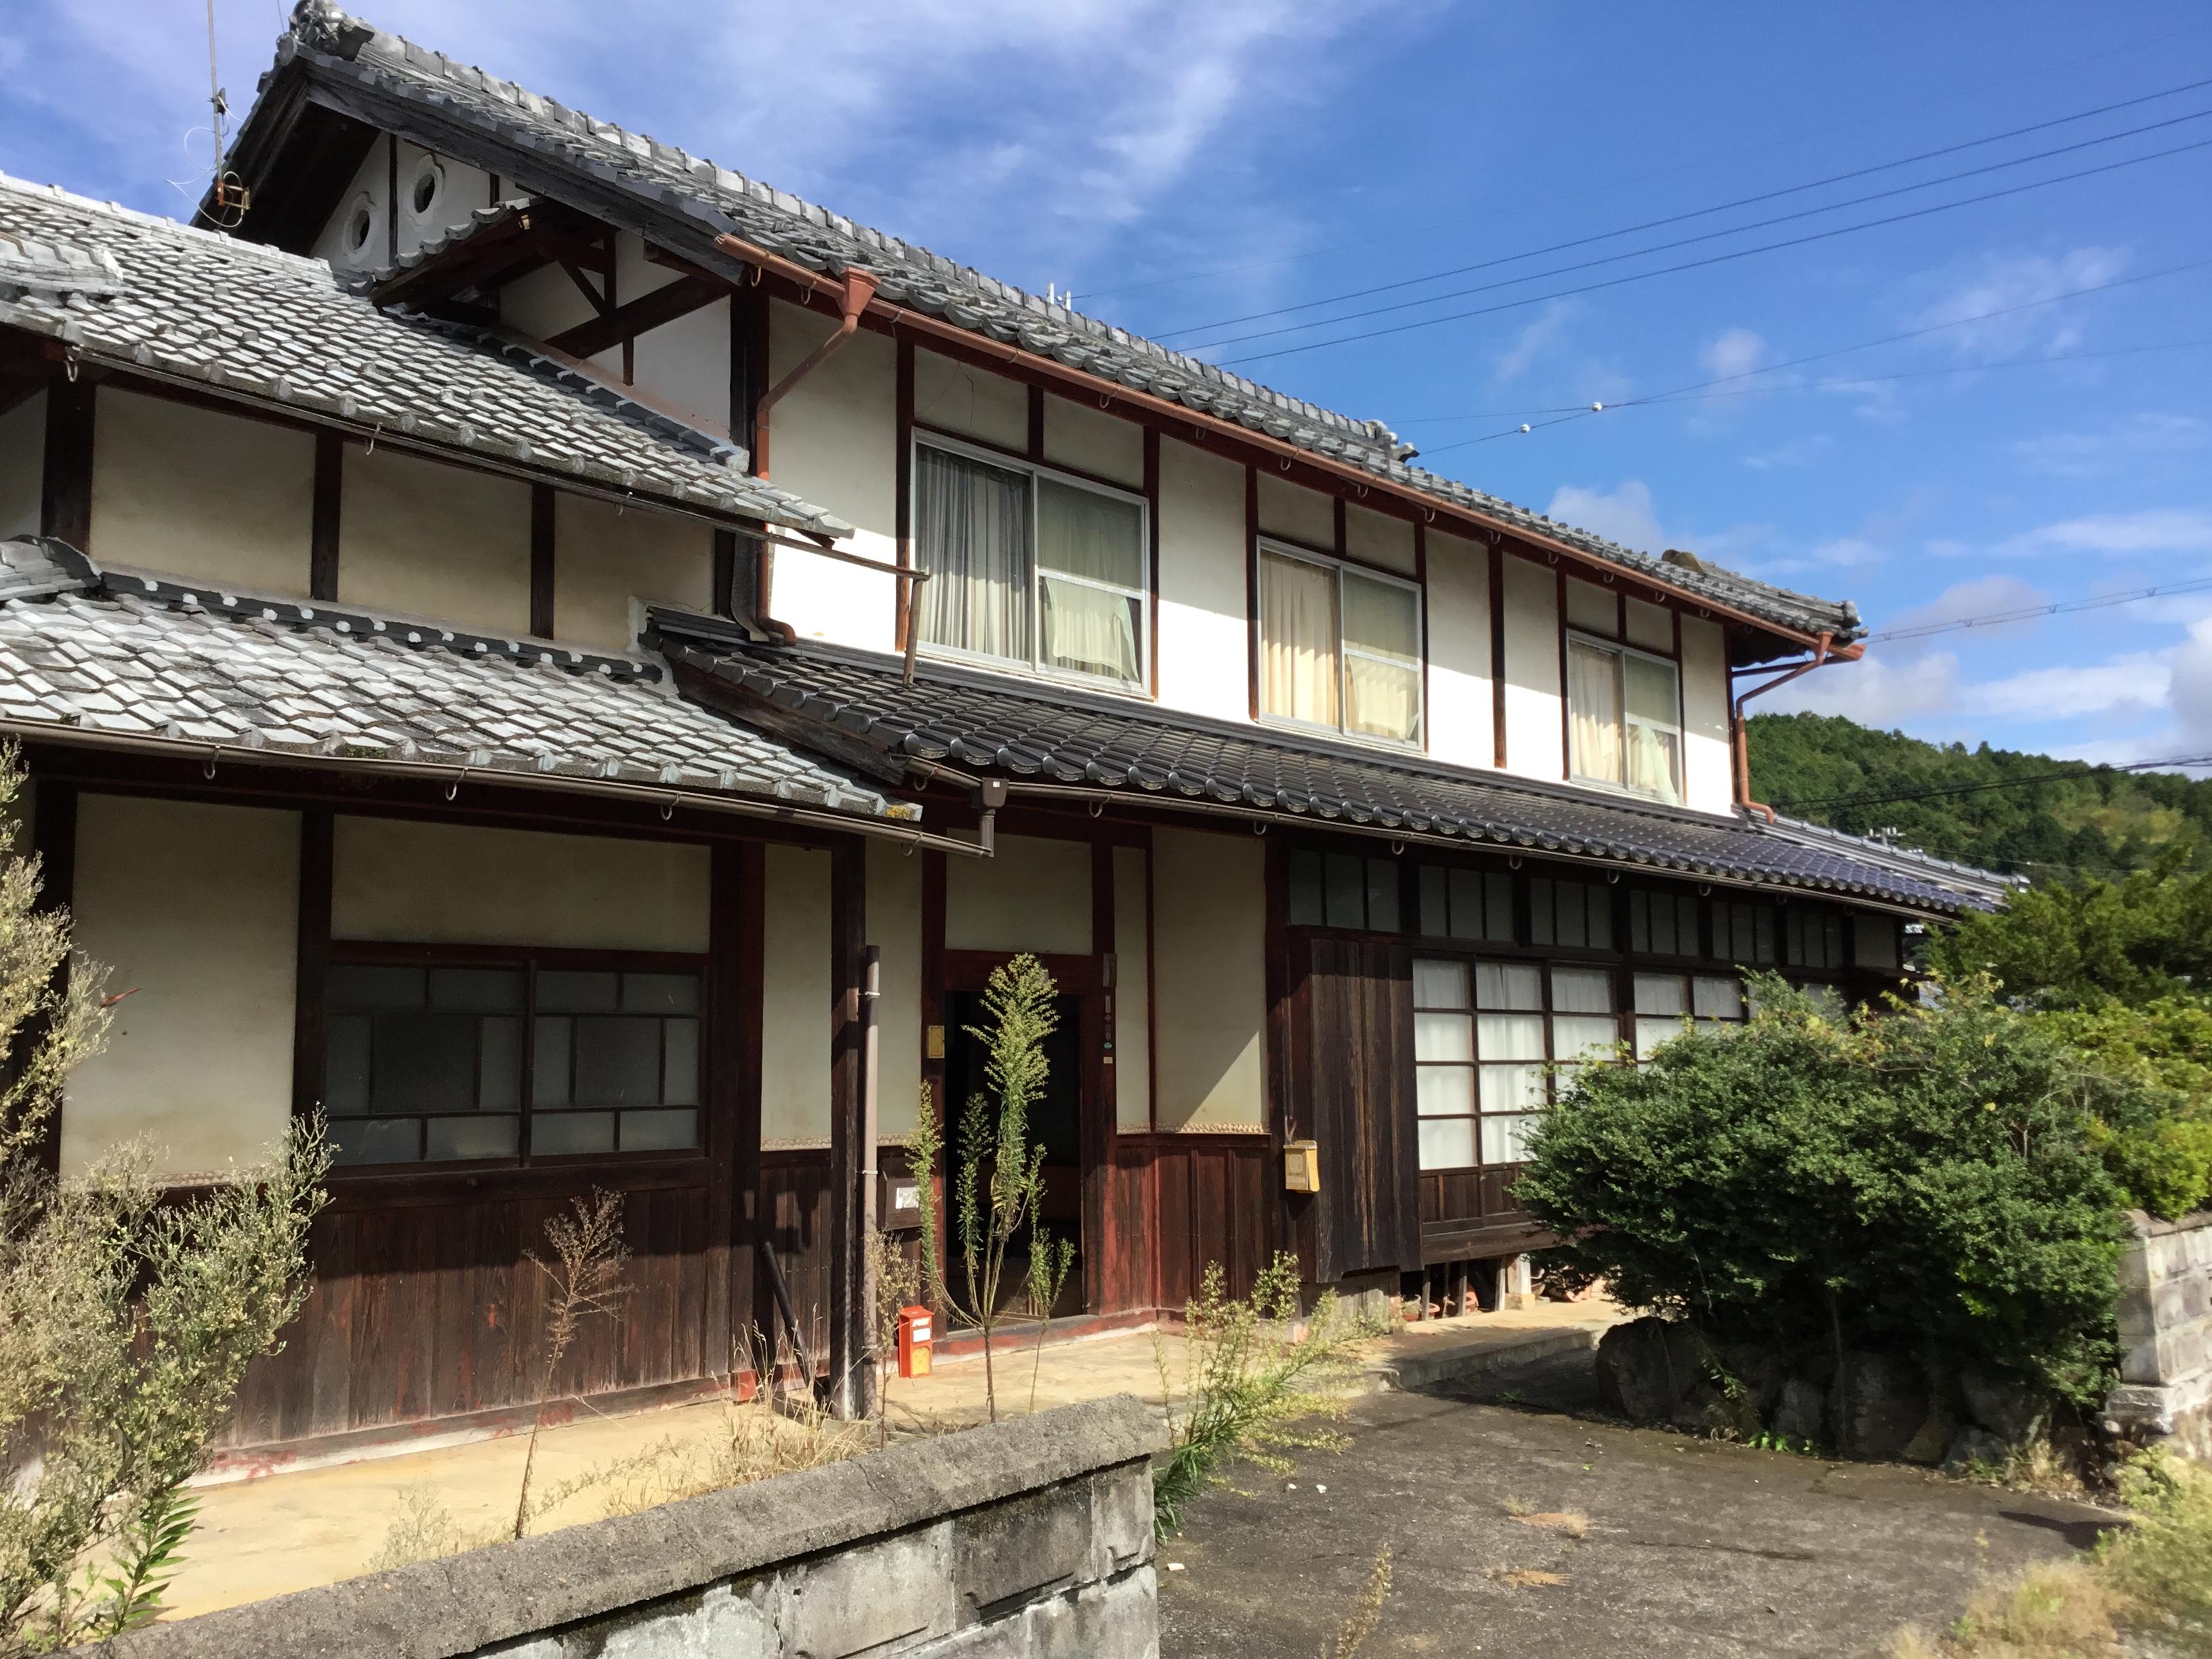 Fukuchiyama Kawagita Old house